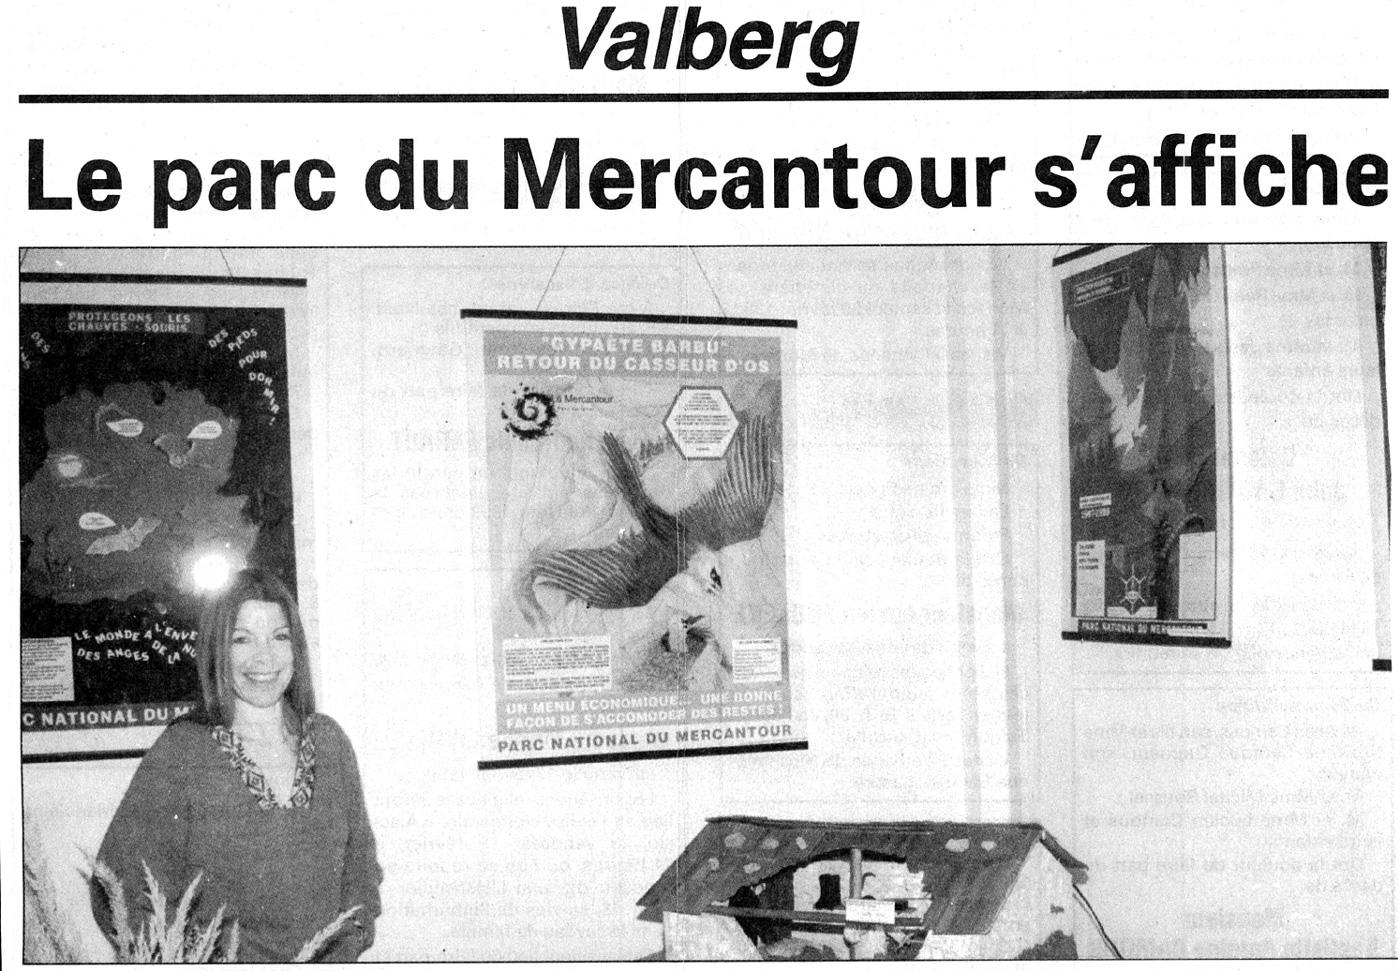 (Nice-Matin - Valberg, 1996 - Photo Louis Bourgue)